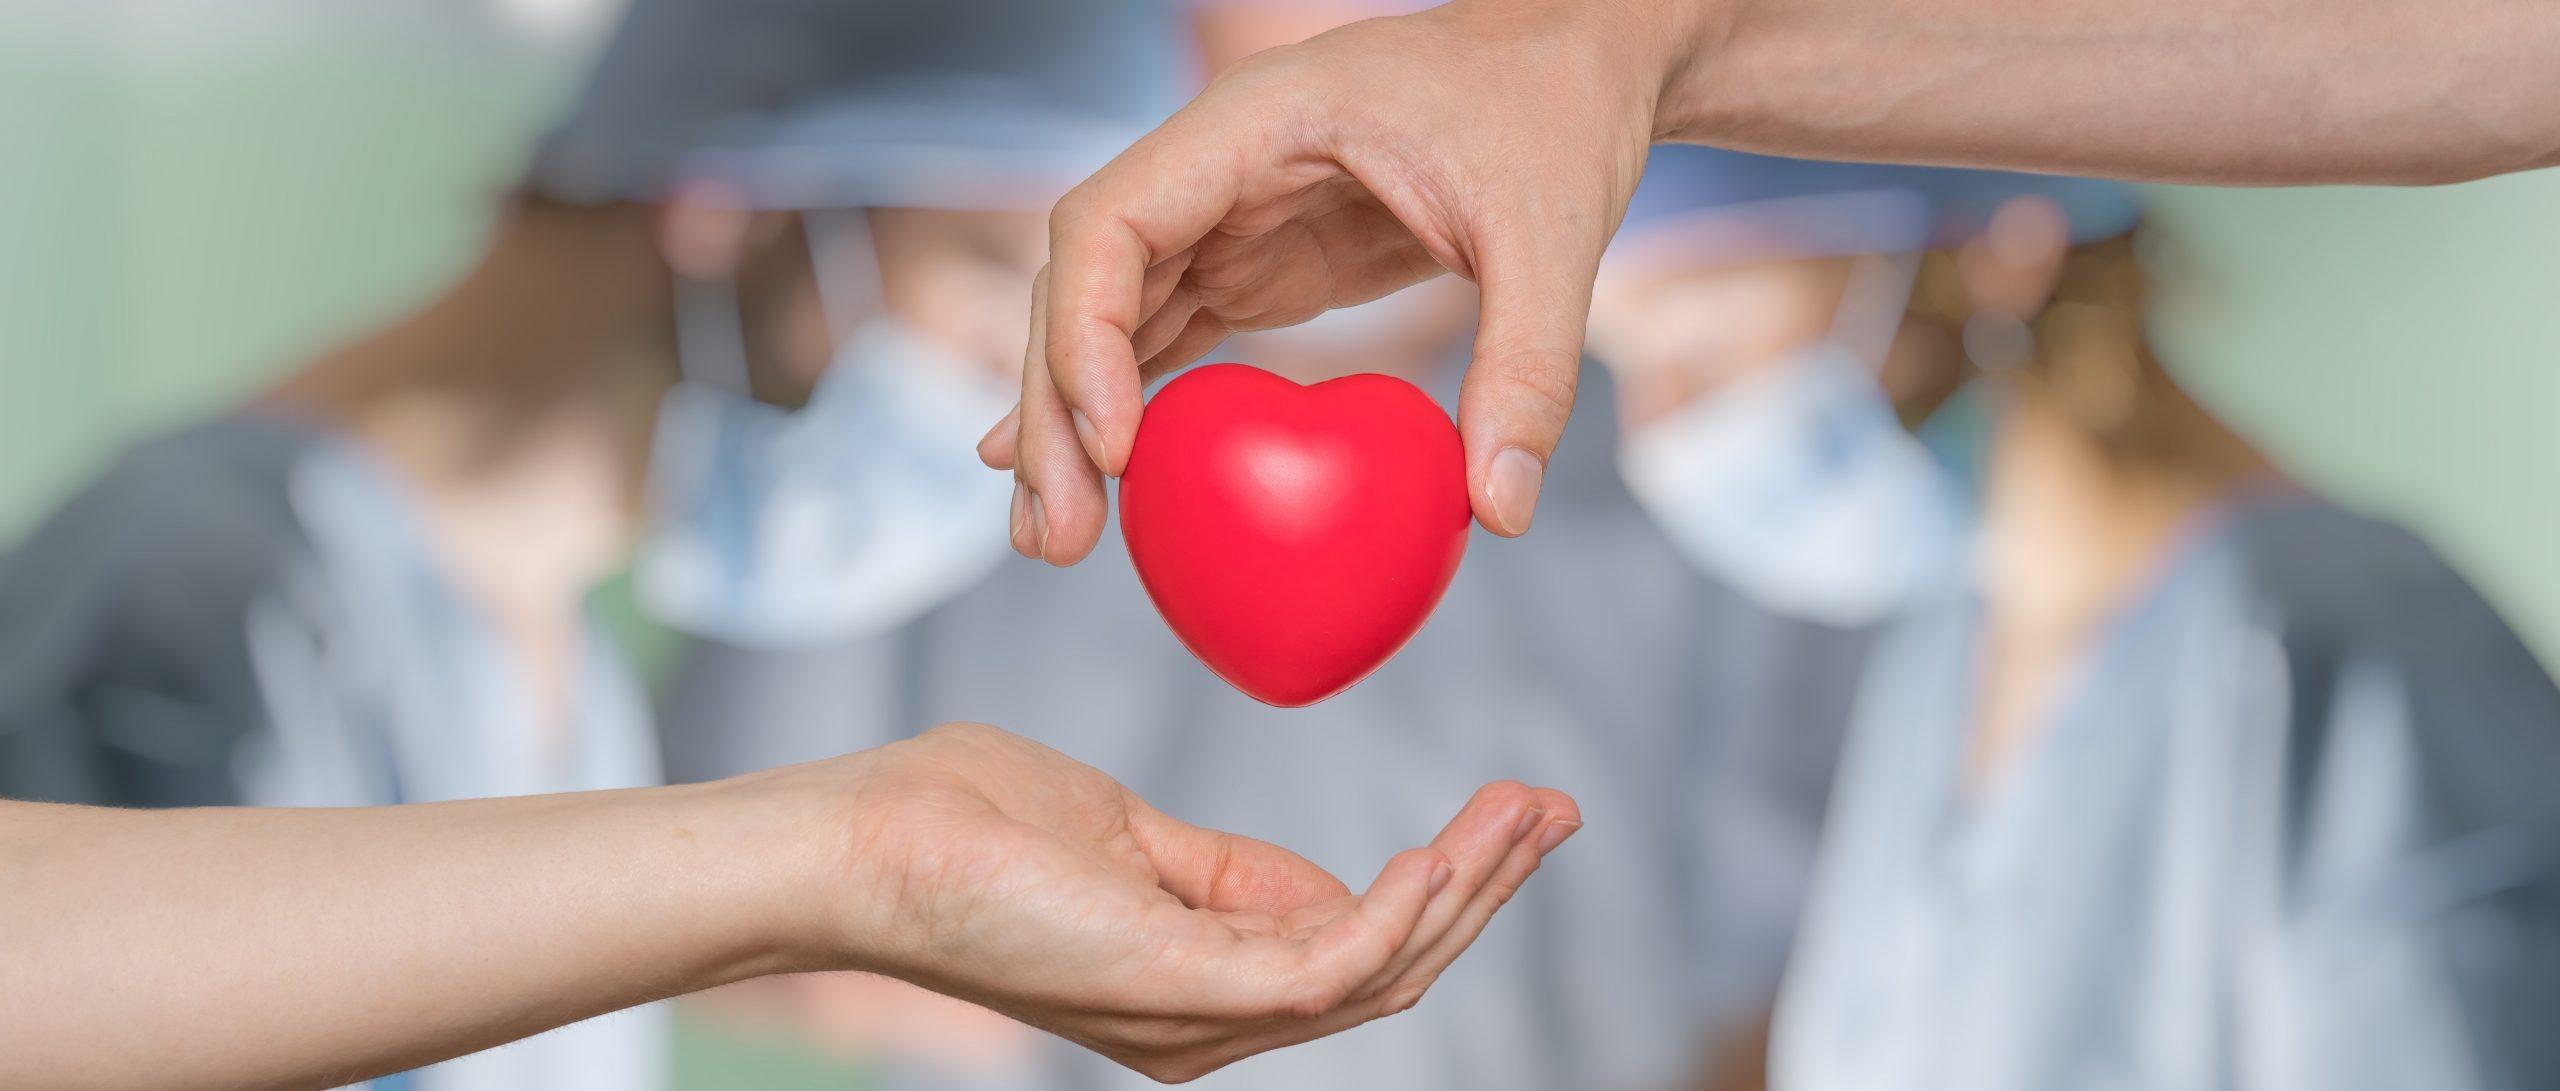 Organ Donation in Malta and Gozo